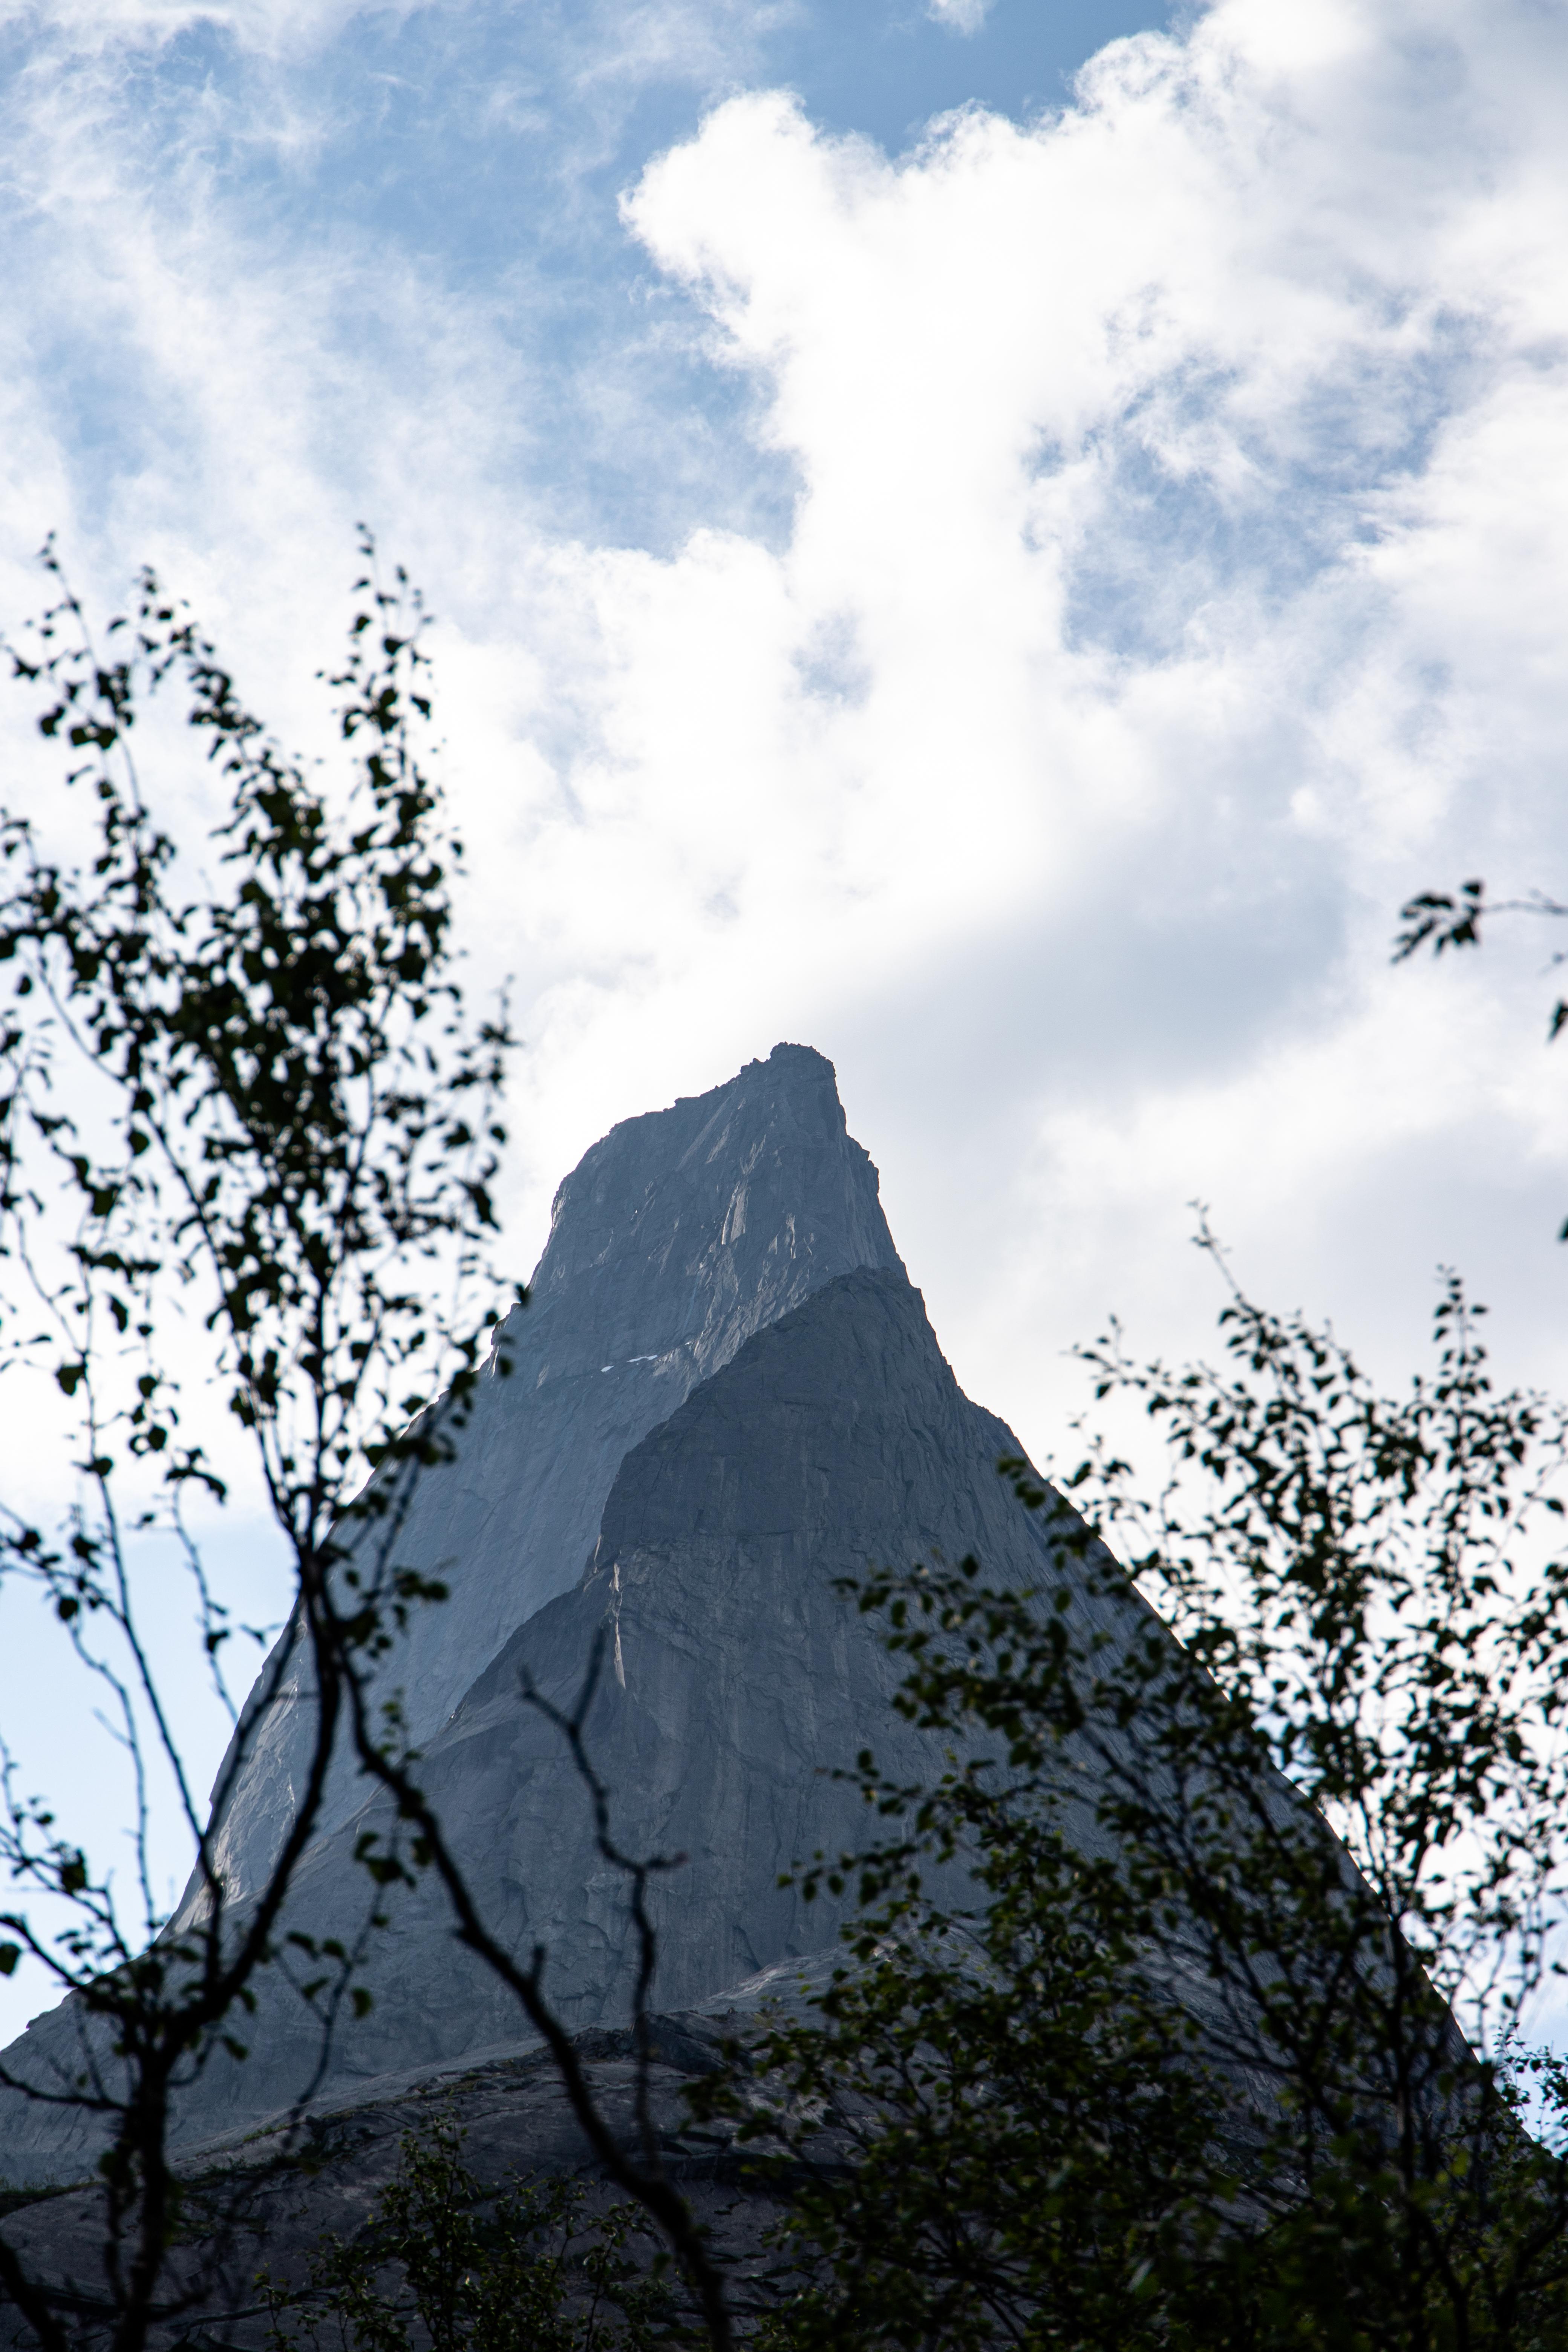 Nordskot, Steigen, Nordland, Nordskottraversen, Nordskot-traversen, travers, fjell, fjelltur, klatring, klatre, klatretur, fjellklatring, klatrekurs, kurs, guide, guidet, Sørskot, Sørskot-tinden, Guiding, føring, fjellføring, tind, norgesferie, reisemål, Norge, Nord-Norge, Nord, Norway, Noreg, North-Norway, Naustholmen, Manshausen, Lofoten, Nordland, Stetind, Geita, Svolværgeita, Salten, Bodø, Strandåtind, Kjerringøy, Ørnenebbet, Skotstind, Skotstindan, Tur, bilder, turbilder, Steigen Mountain guides, Vennetur, friluftsliv, historie, geografi, Stetinden.